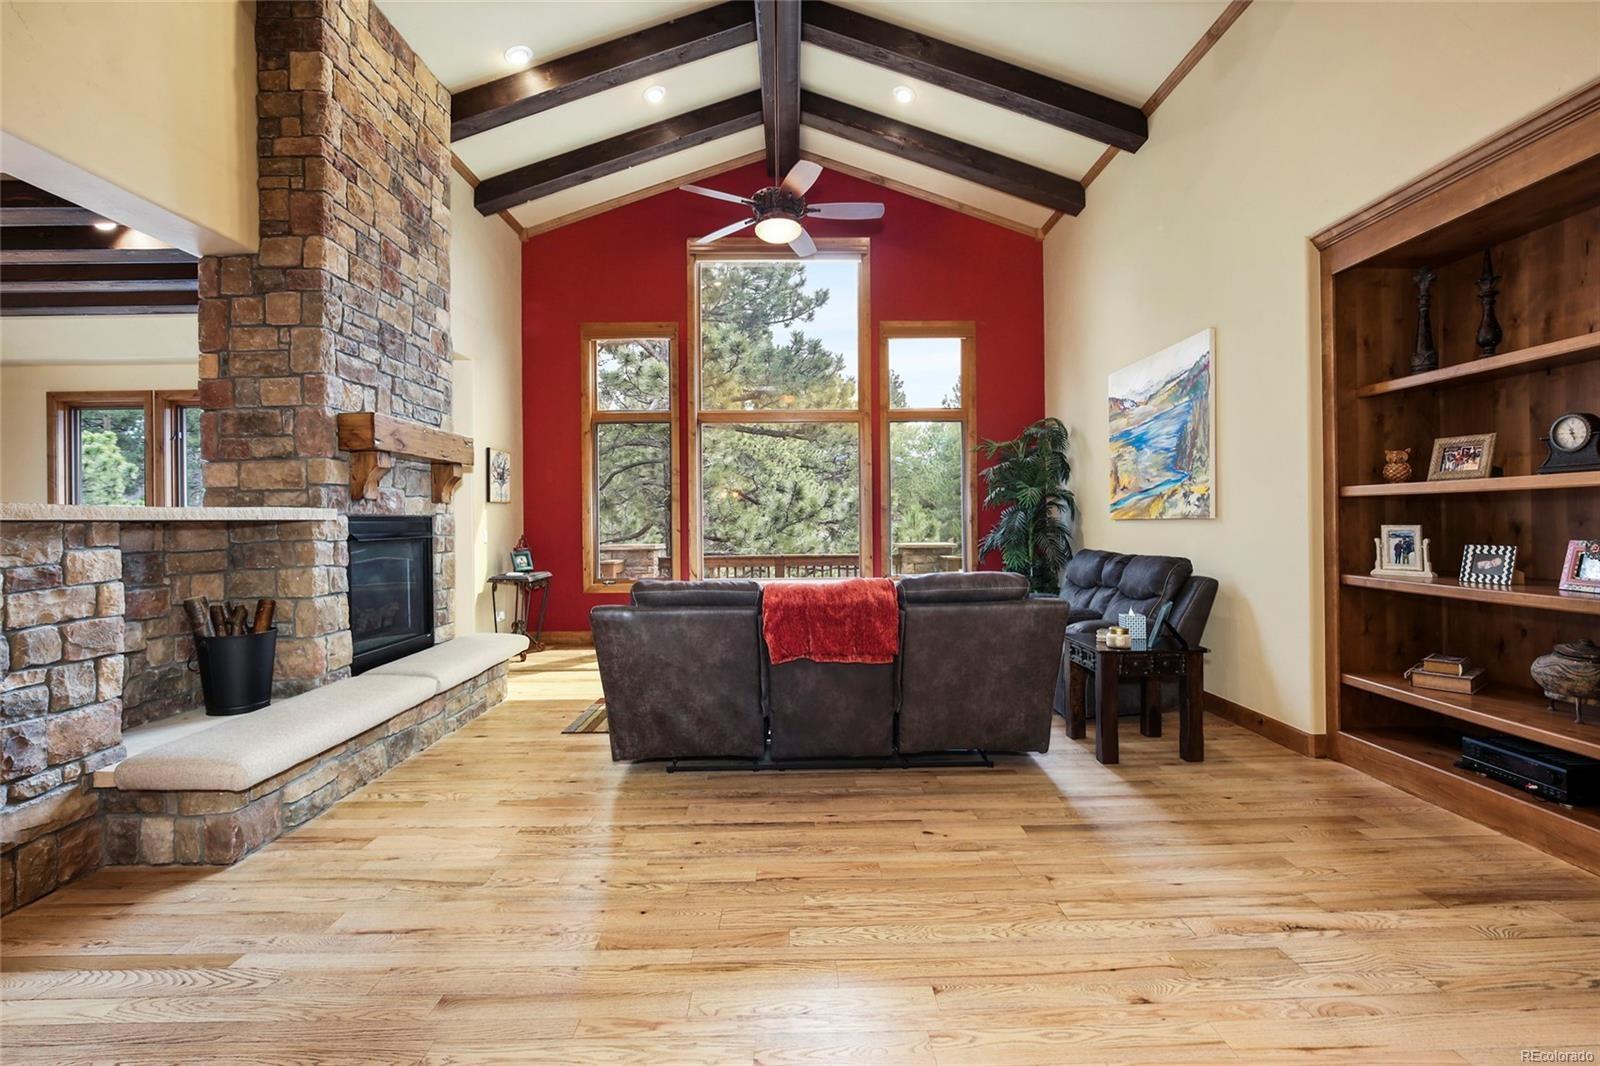 MLS# 4879945 - 8 - 2392 Saddleback Drive, Castle Rock, CO 80104